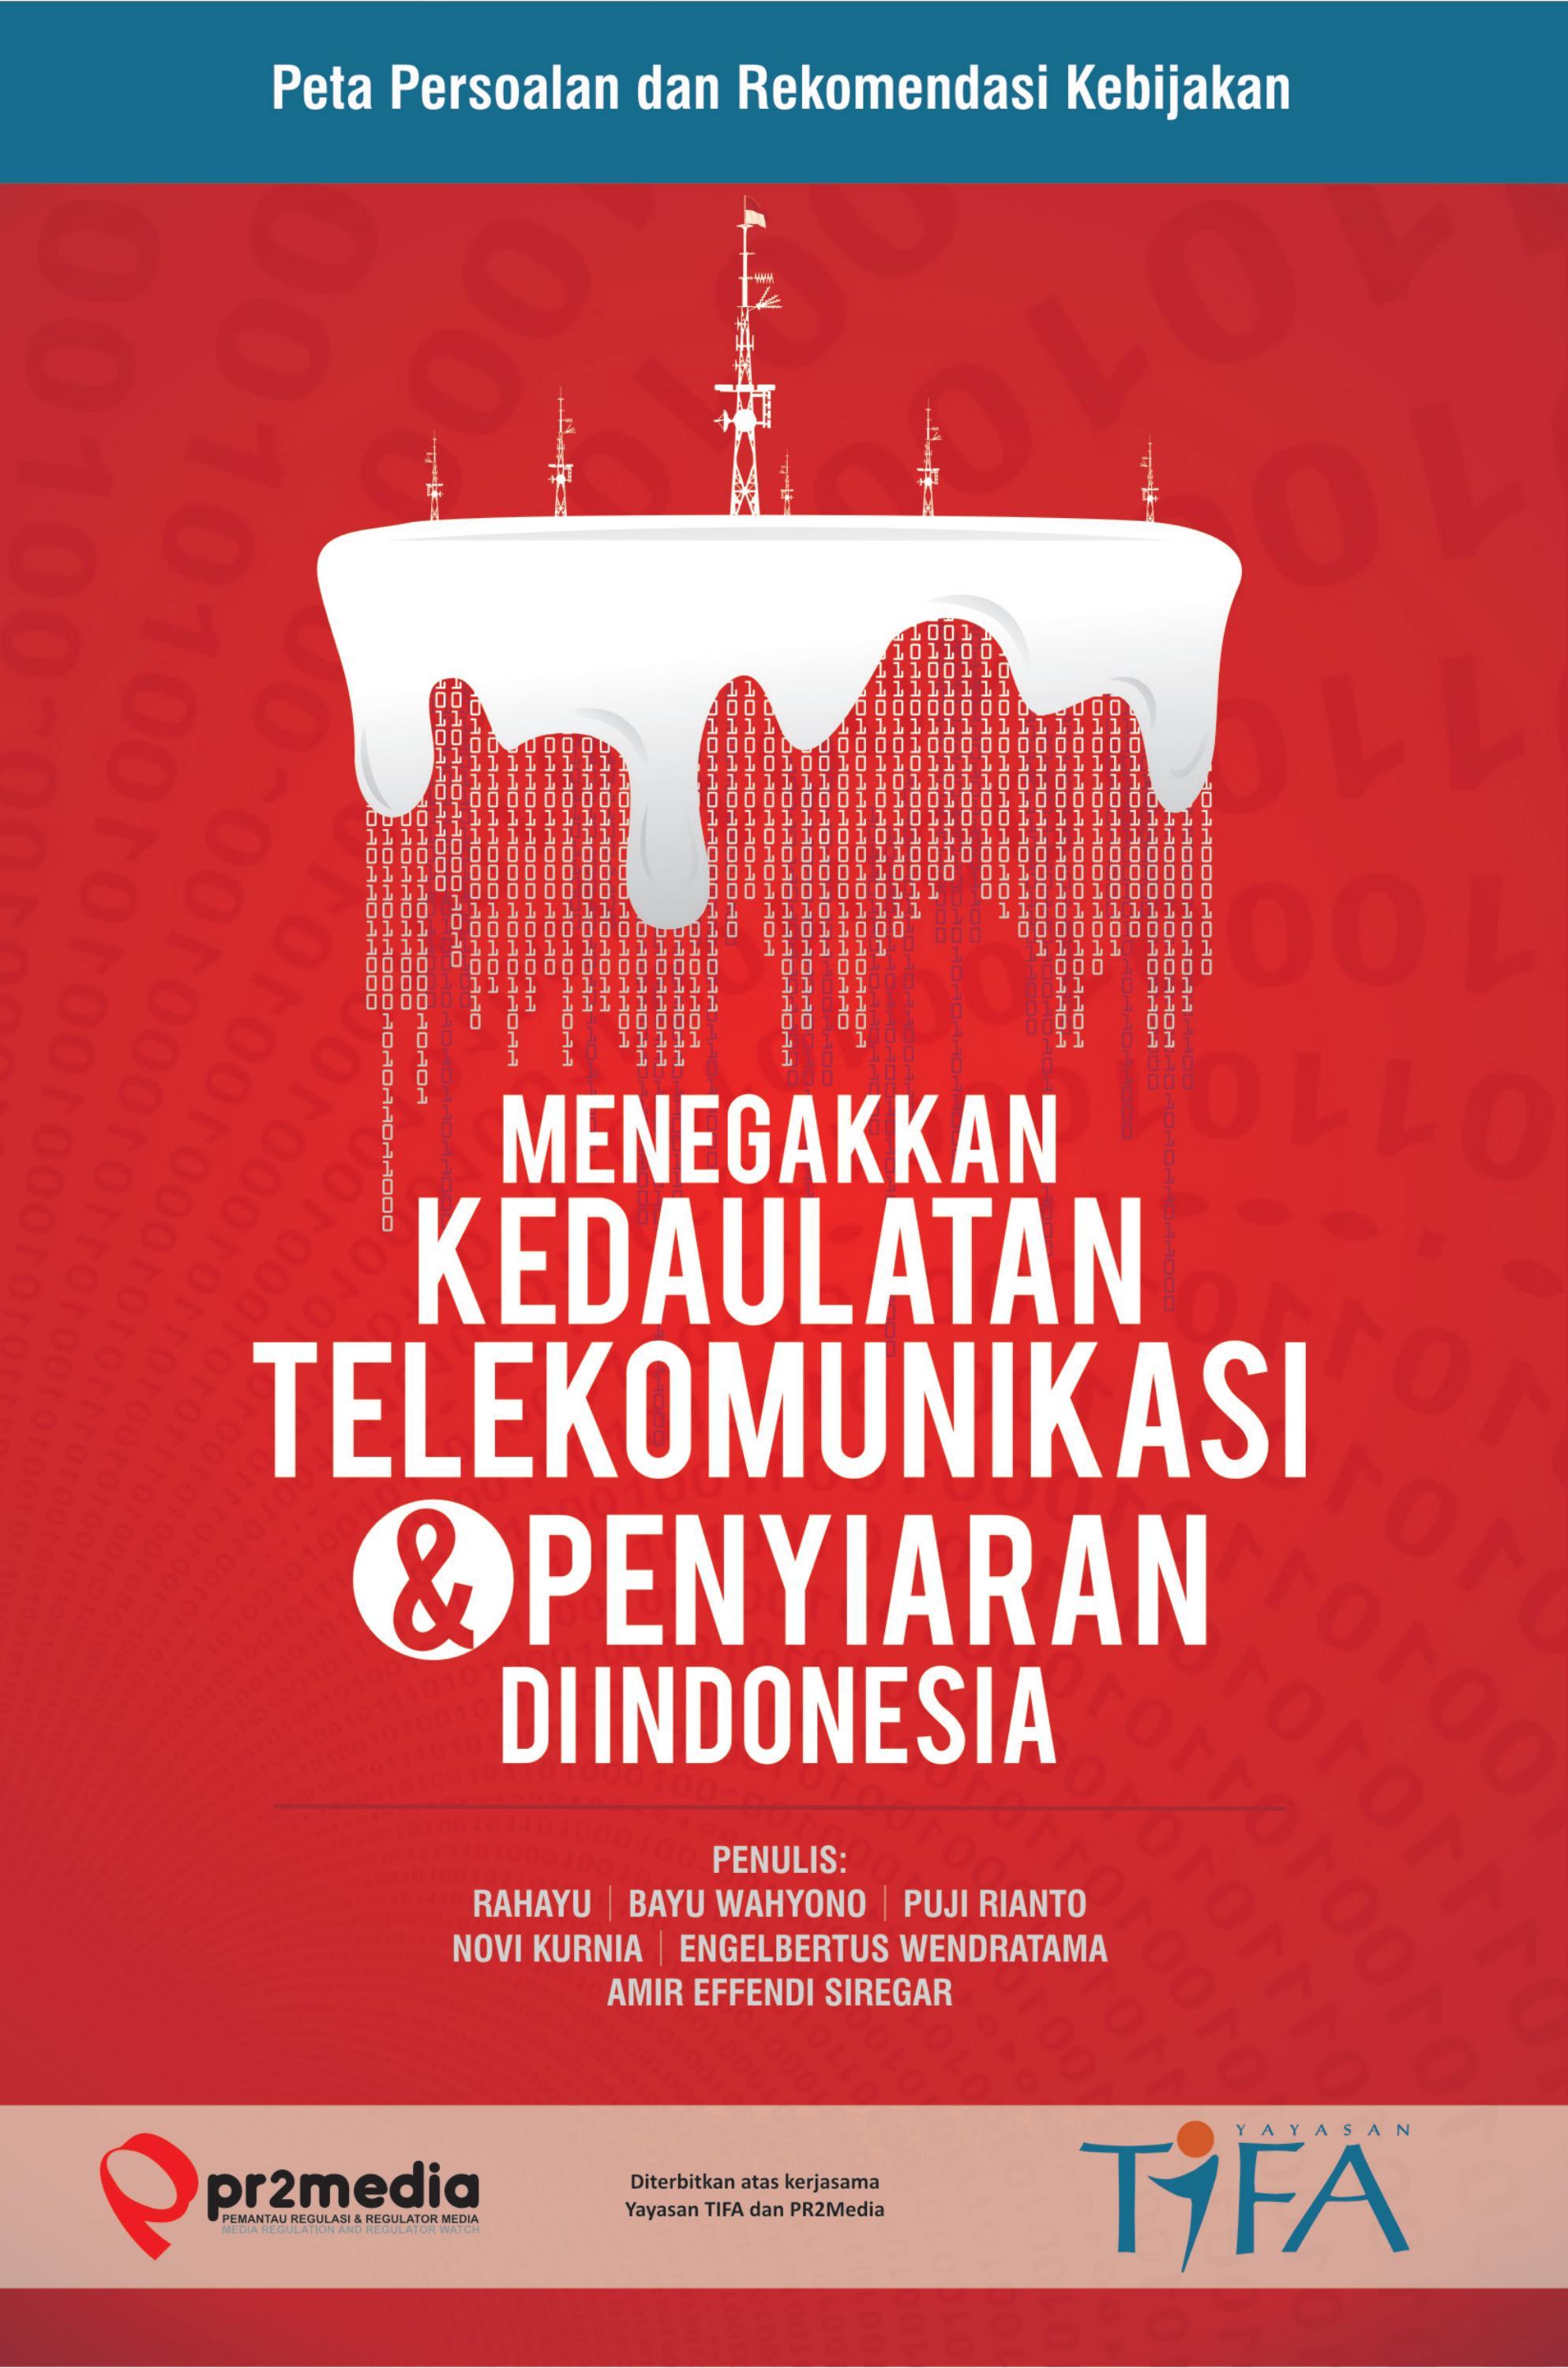 Menegakkan Kedaulatan Telekomunikasi   Penyiaran di Indonesia by Tifa  Foundation - issuu 1be85dbf46